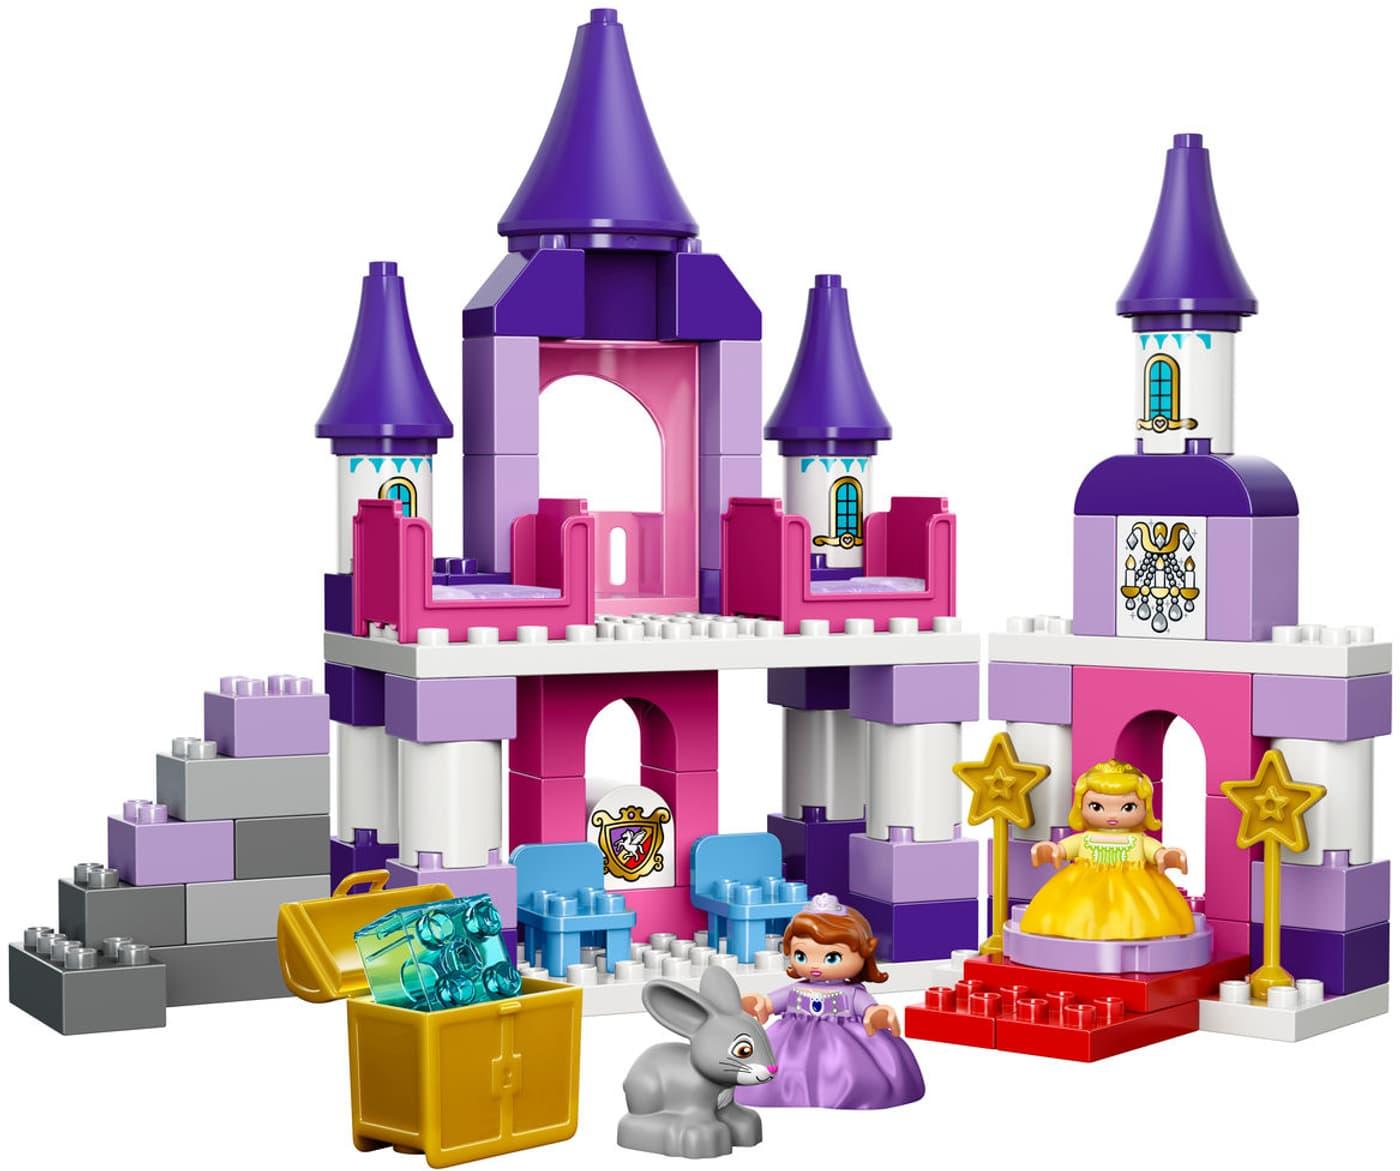 Lego duplo sofia the first le château royal de la princesse sofia ...